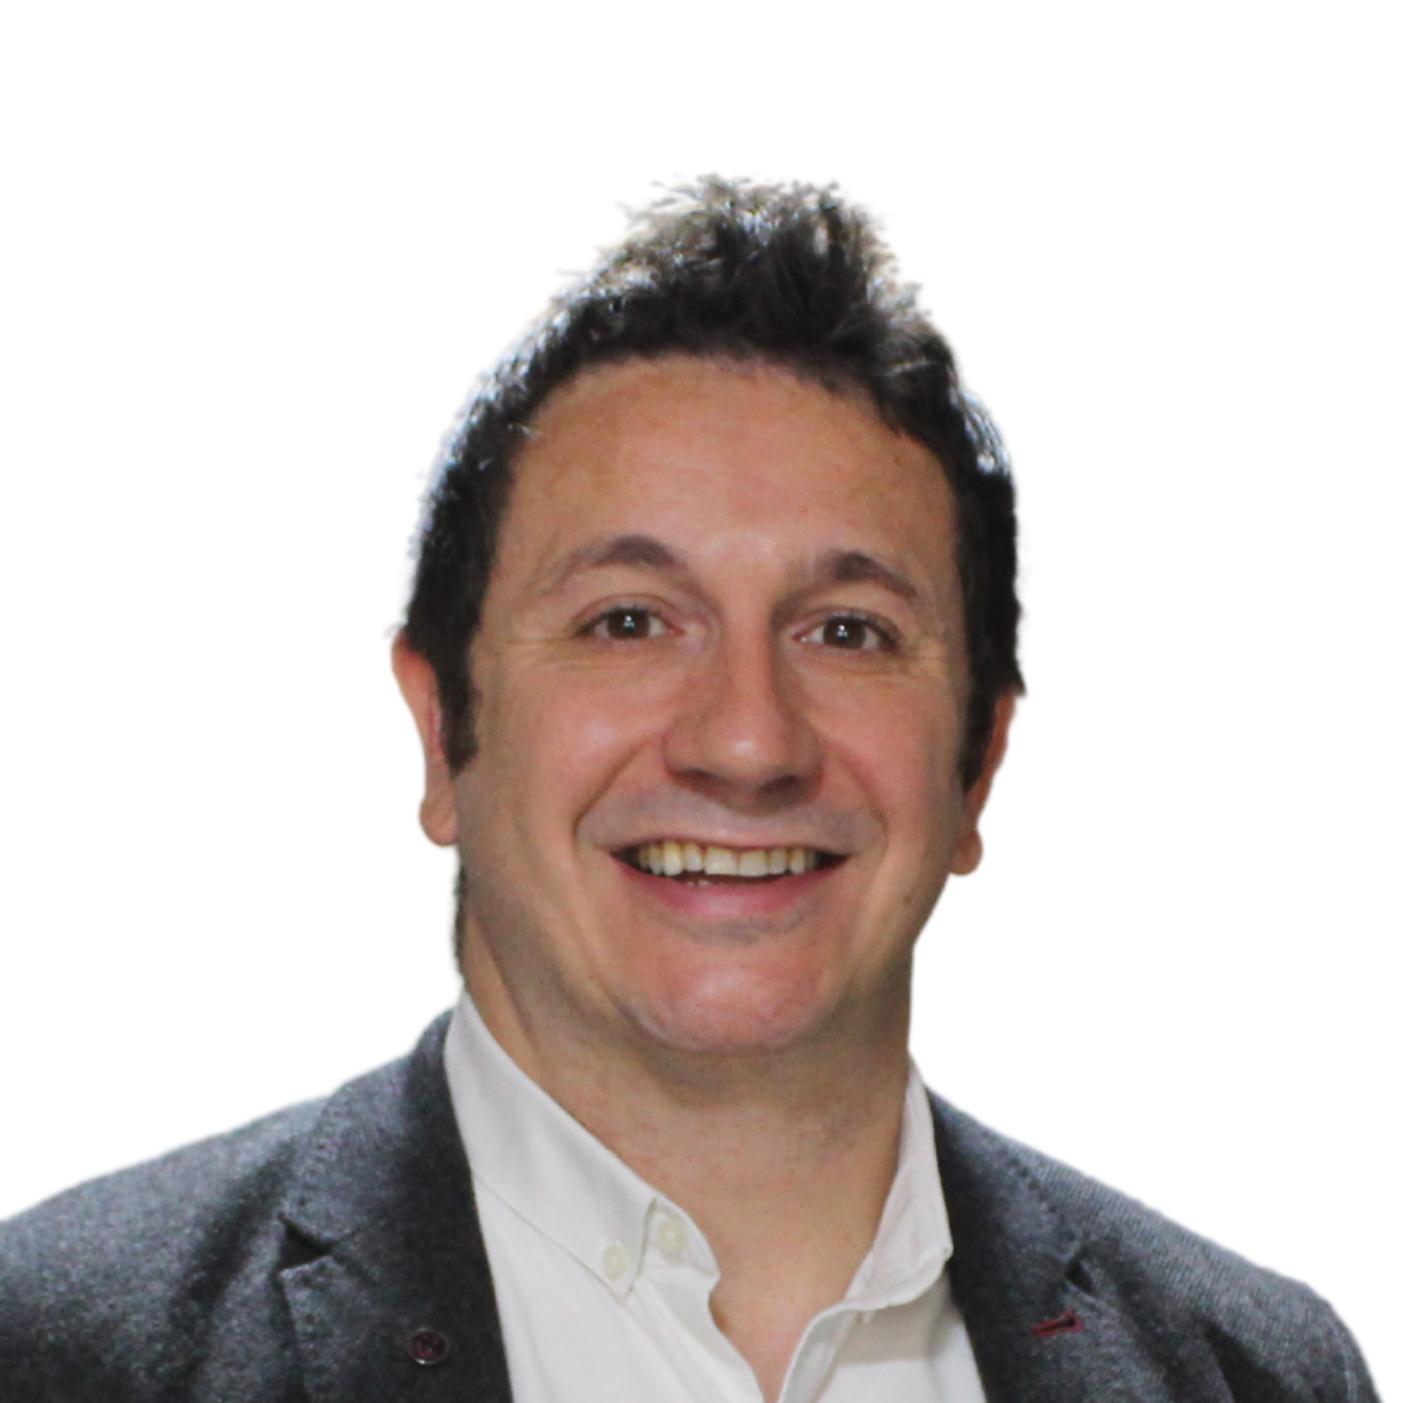 Mike Moran - Head of Product